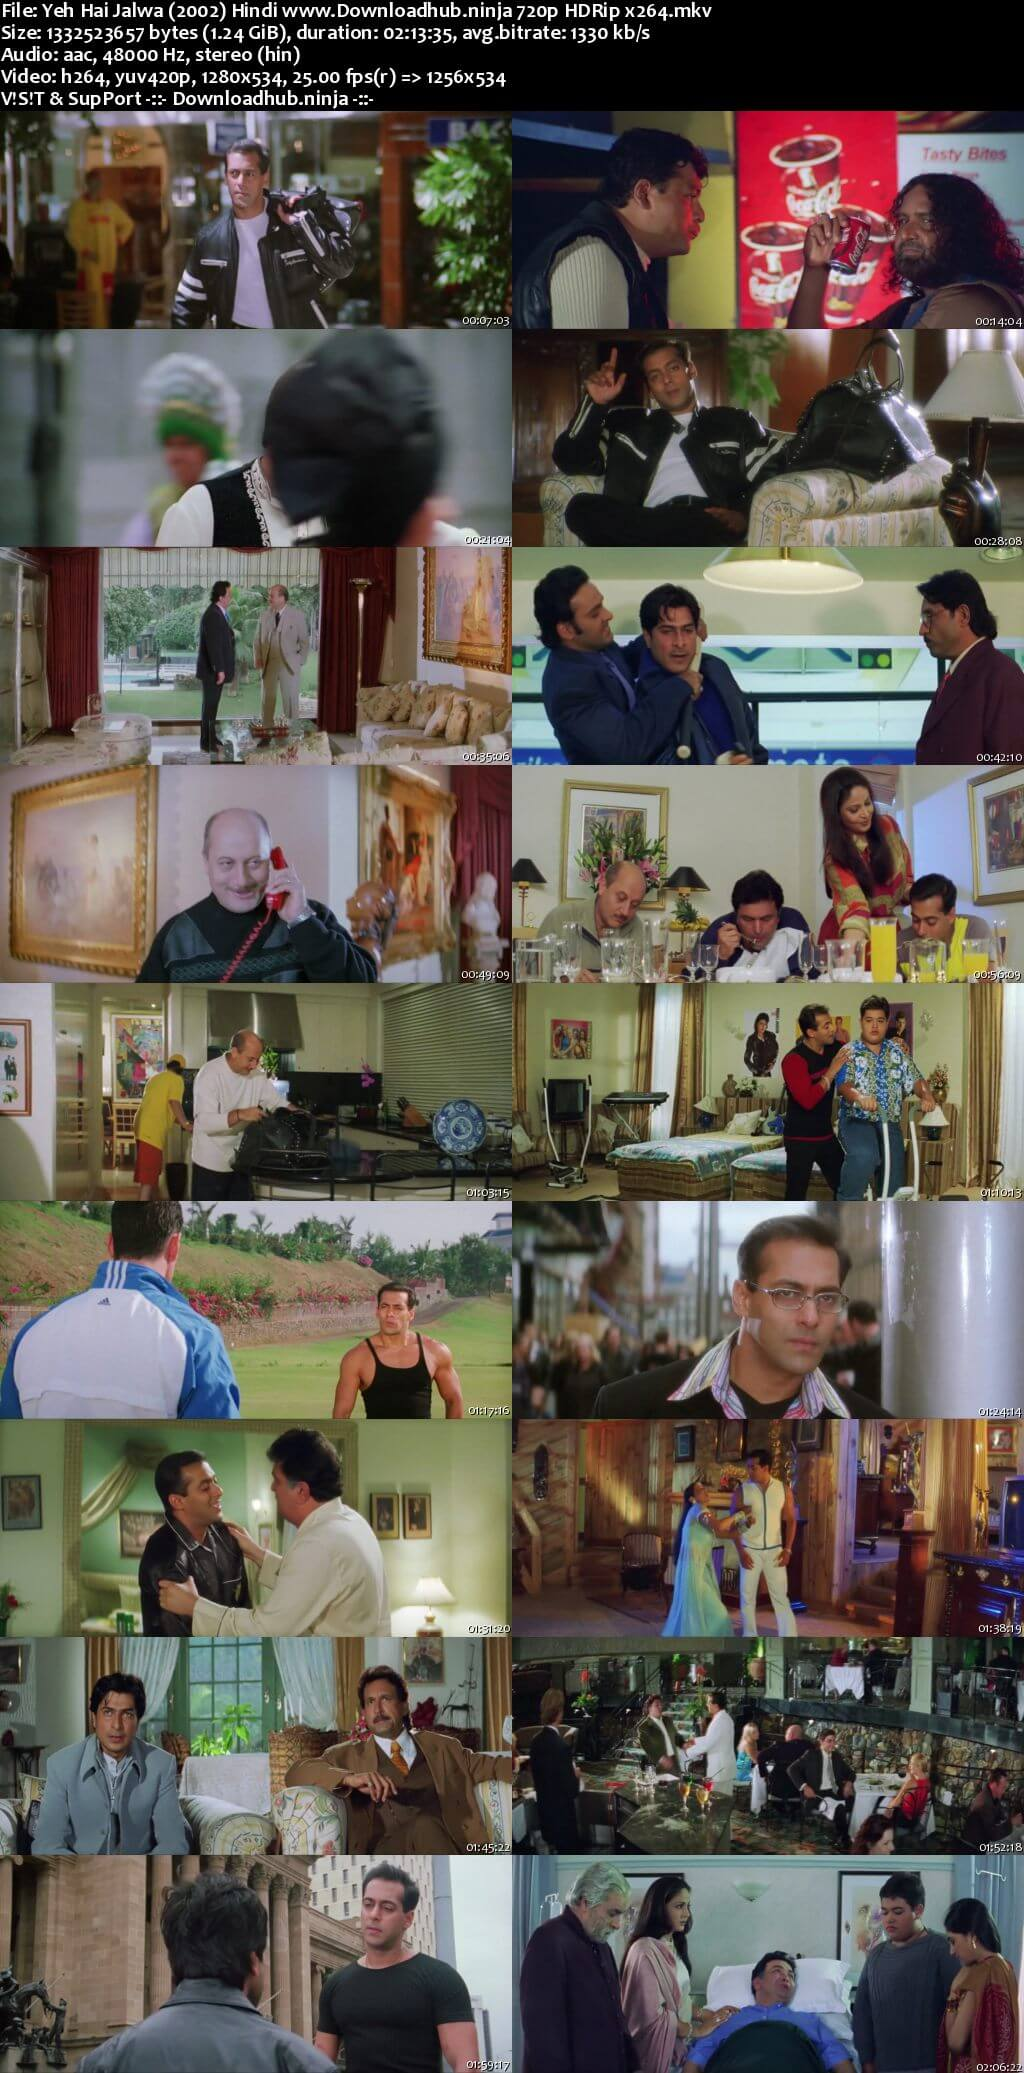 Yeh Hai Jalwa 2002 Hindi 720p HDRip x264